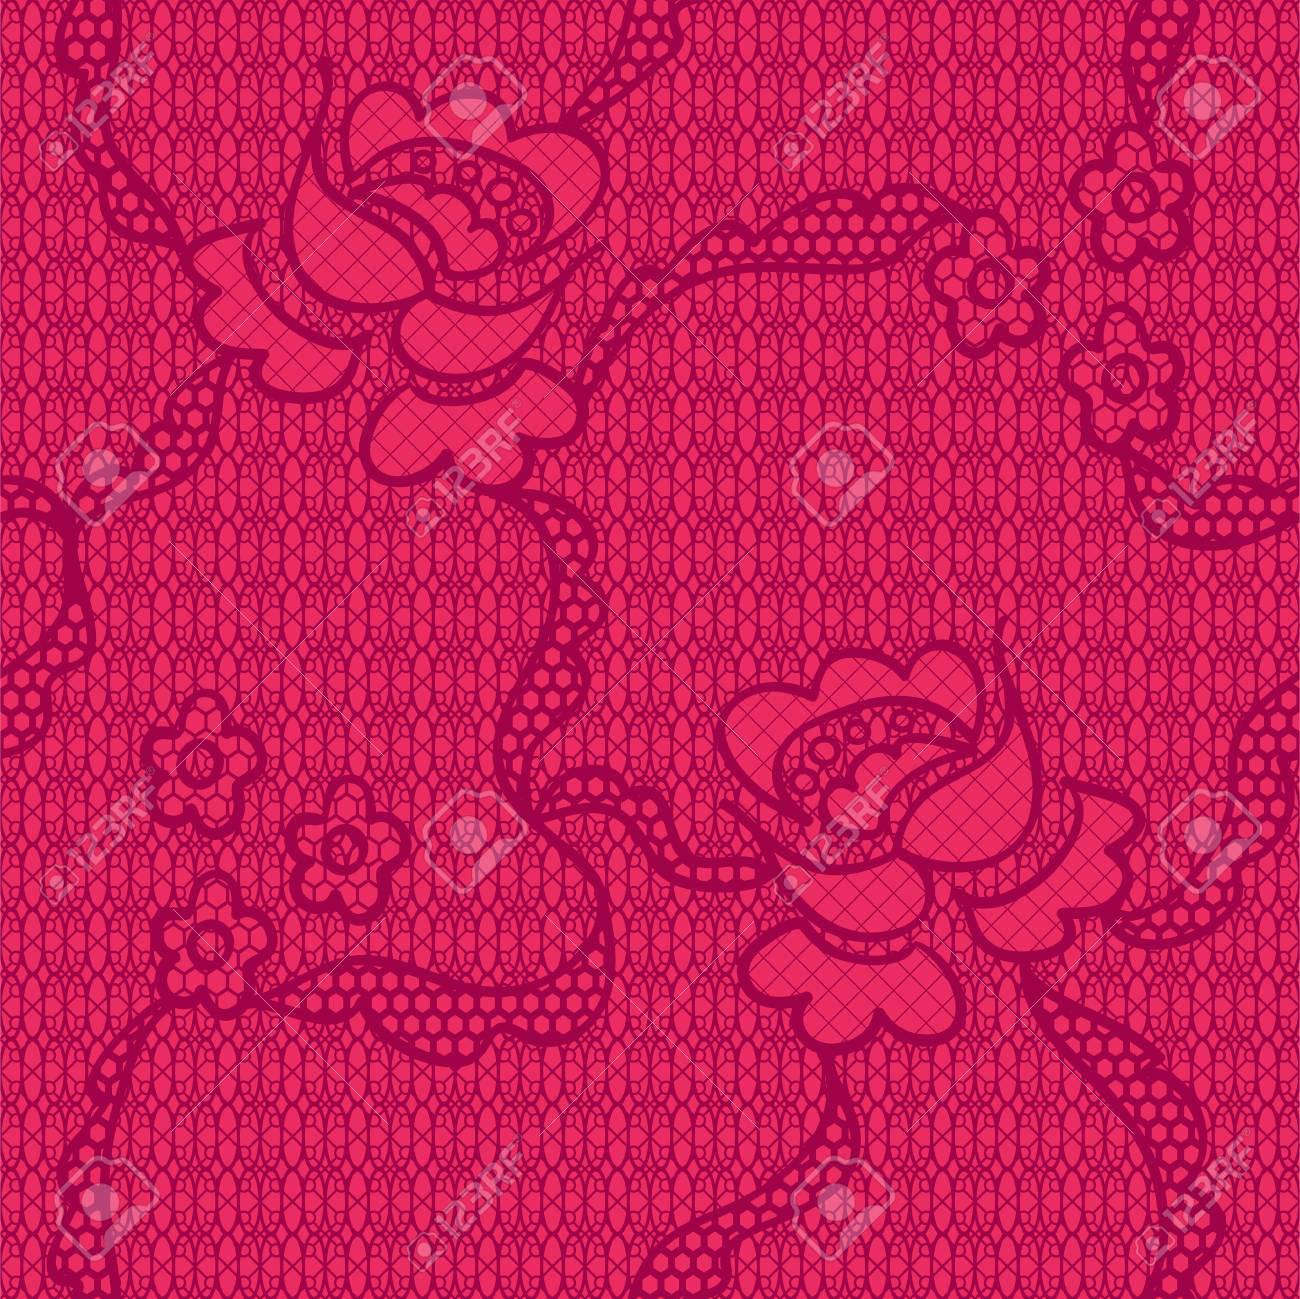 Flowers Seamless Pattern Stock Vector - 13104014